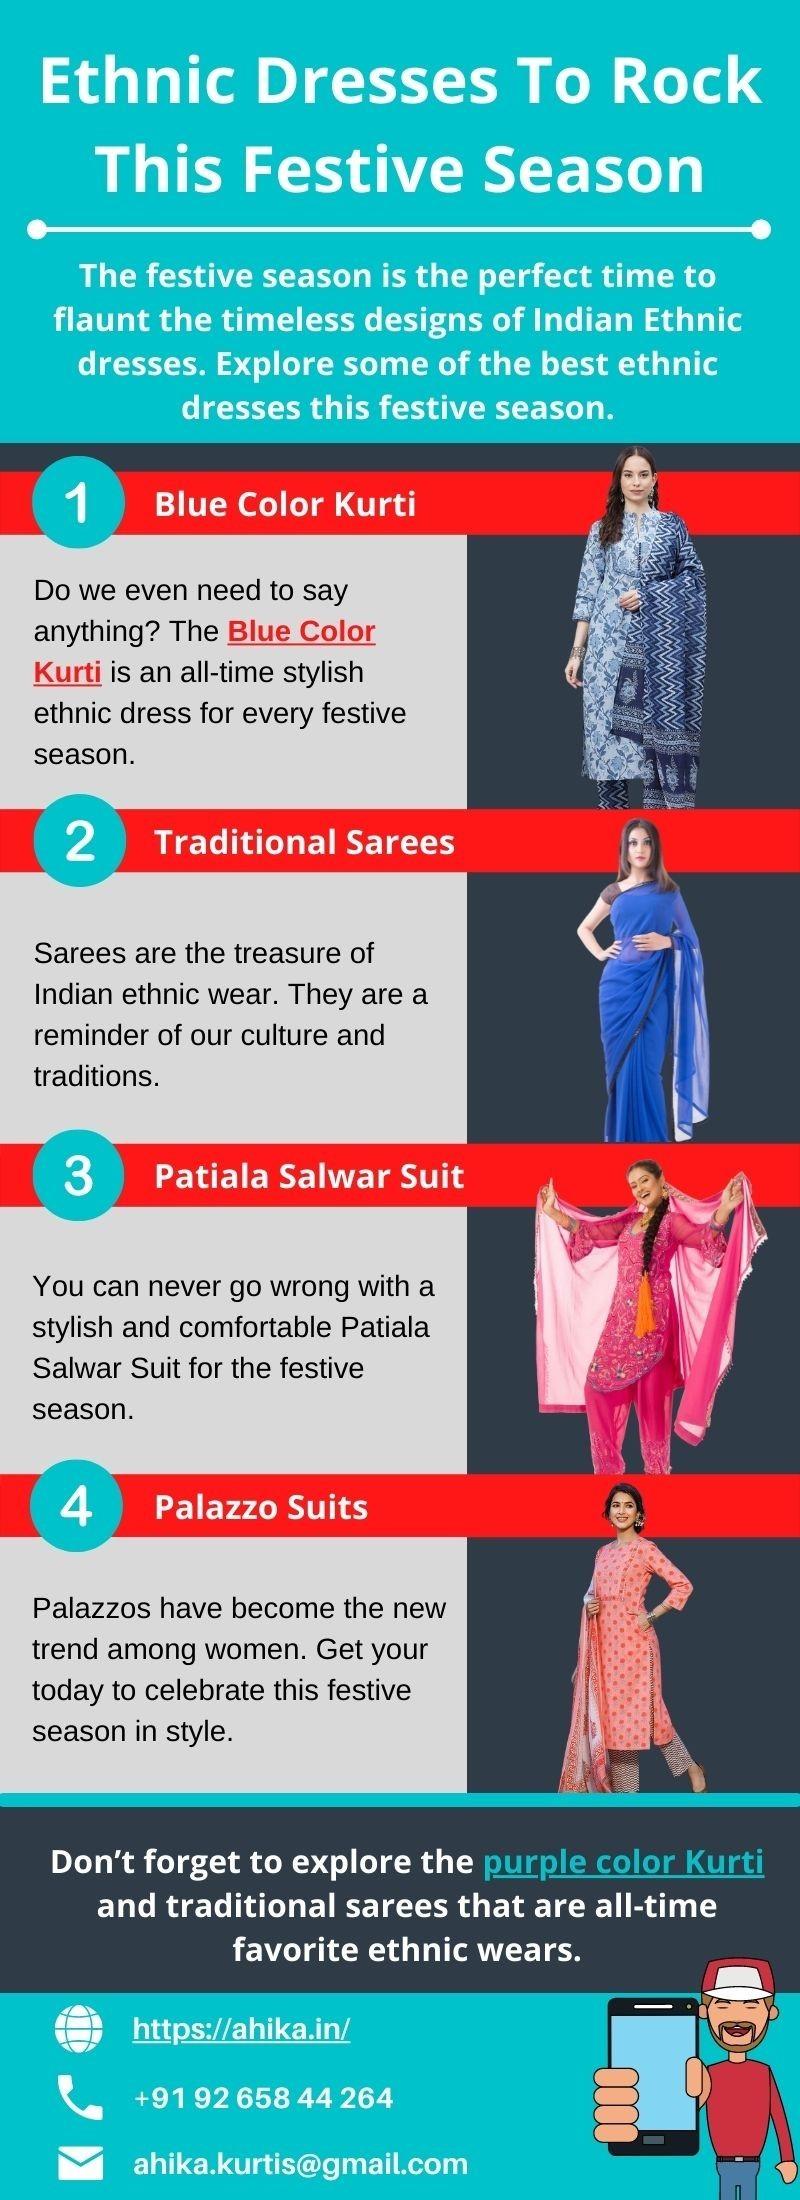 Ethnic Dresses To Rock This Festive Season